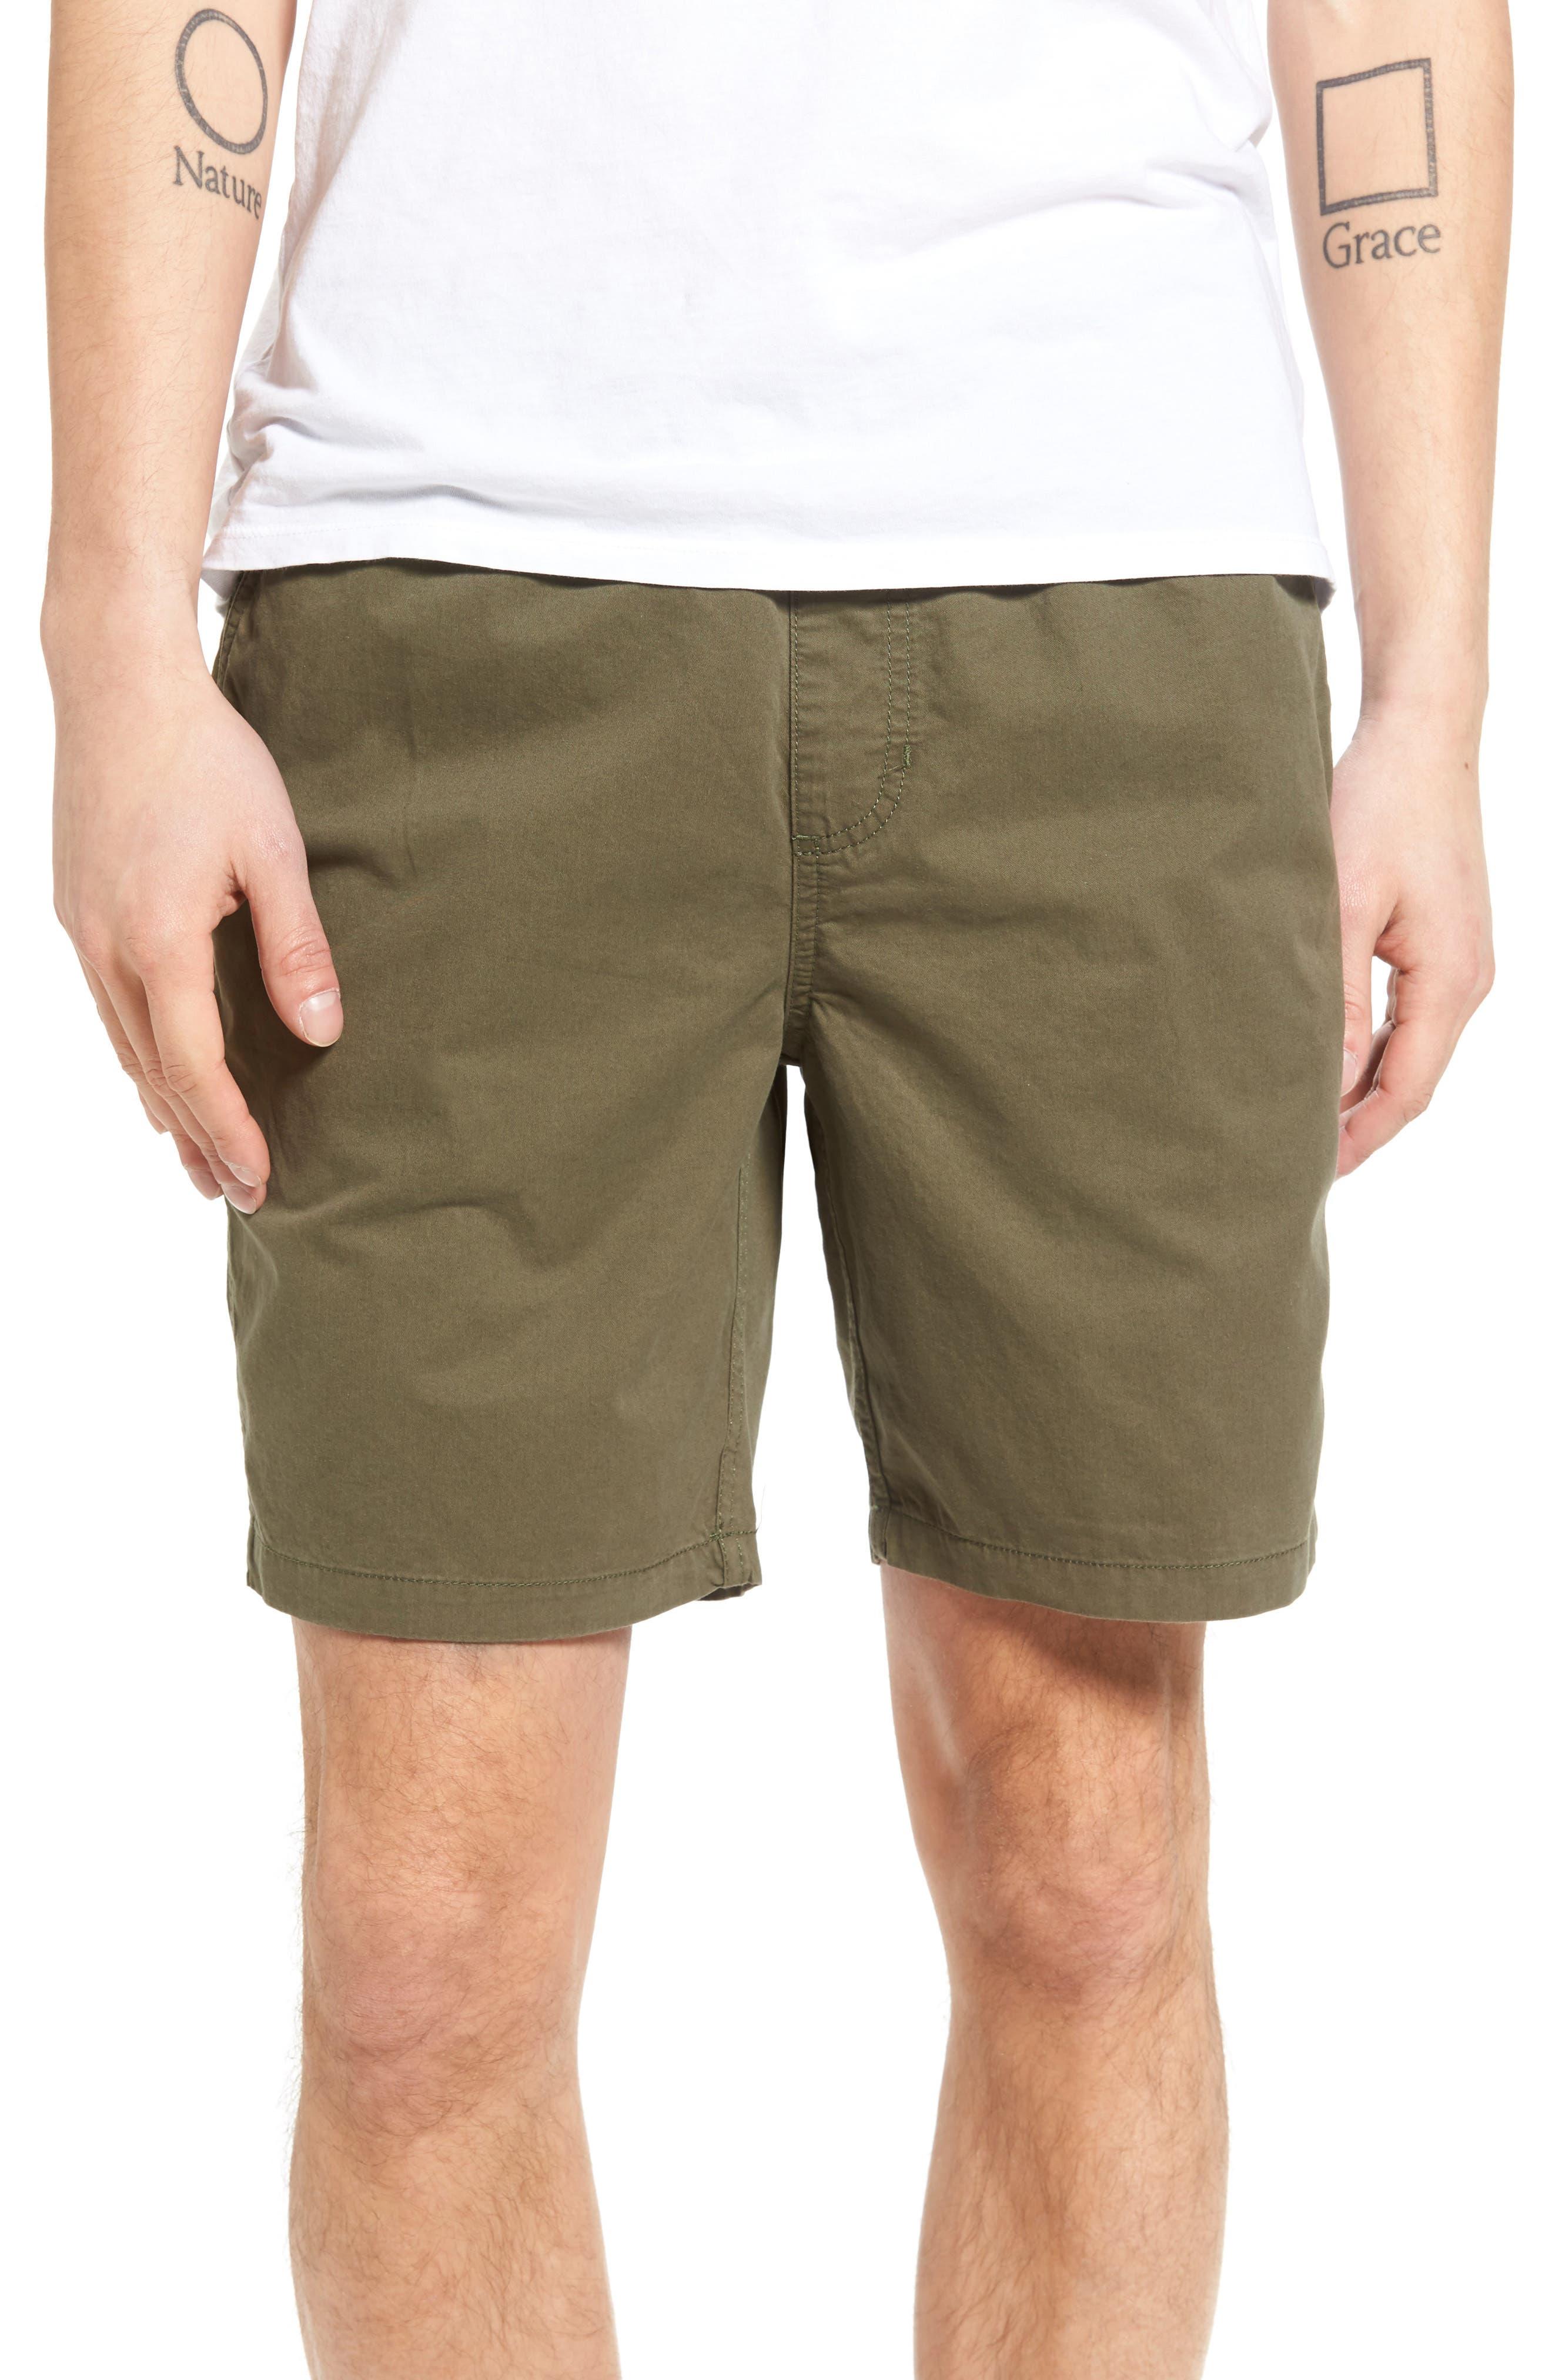 Range Shorts,                             Main thumbnail 2, color,